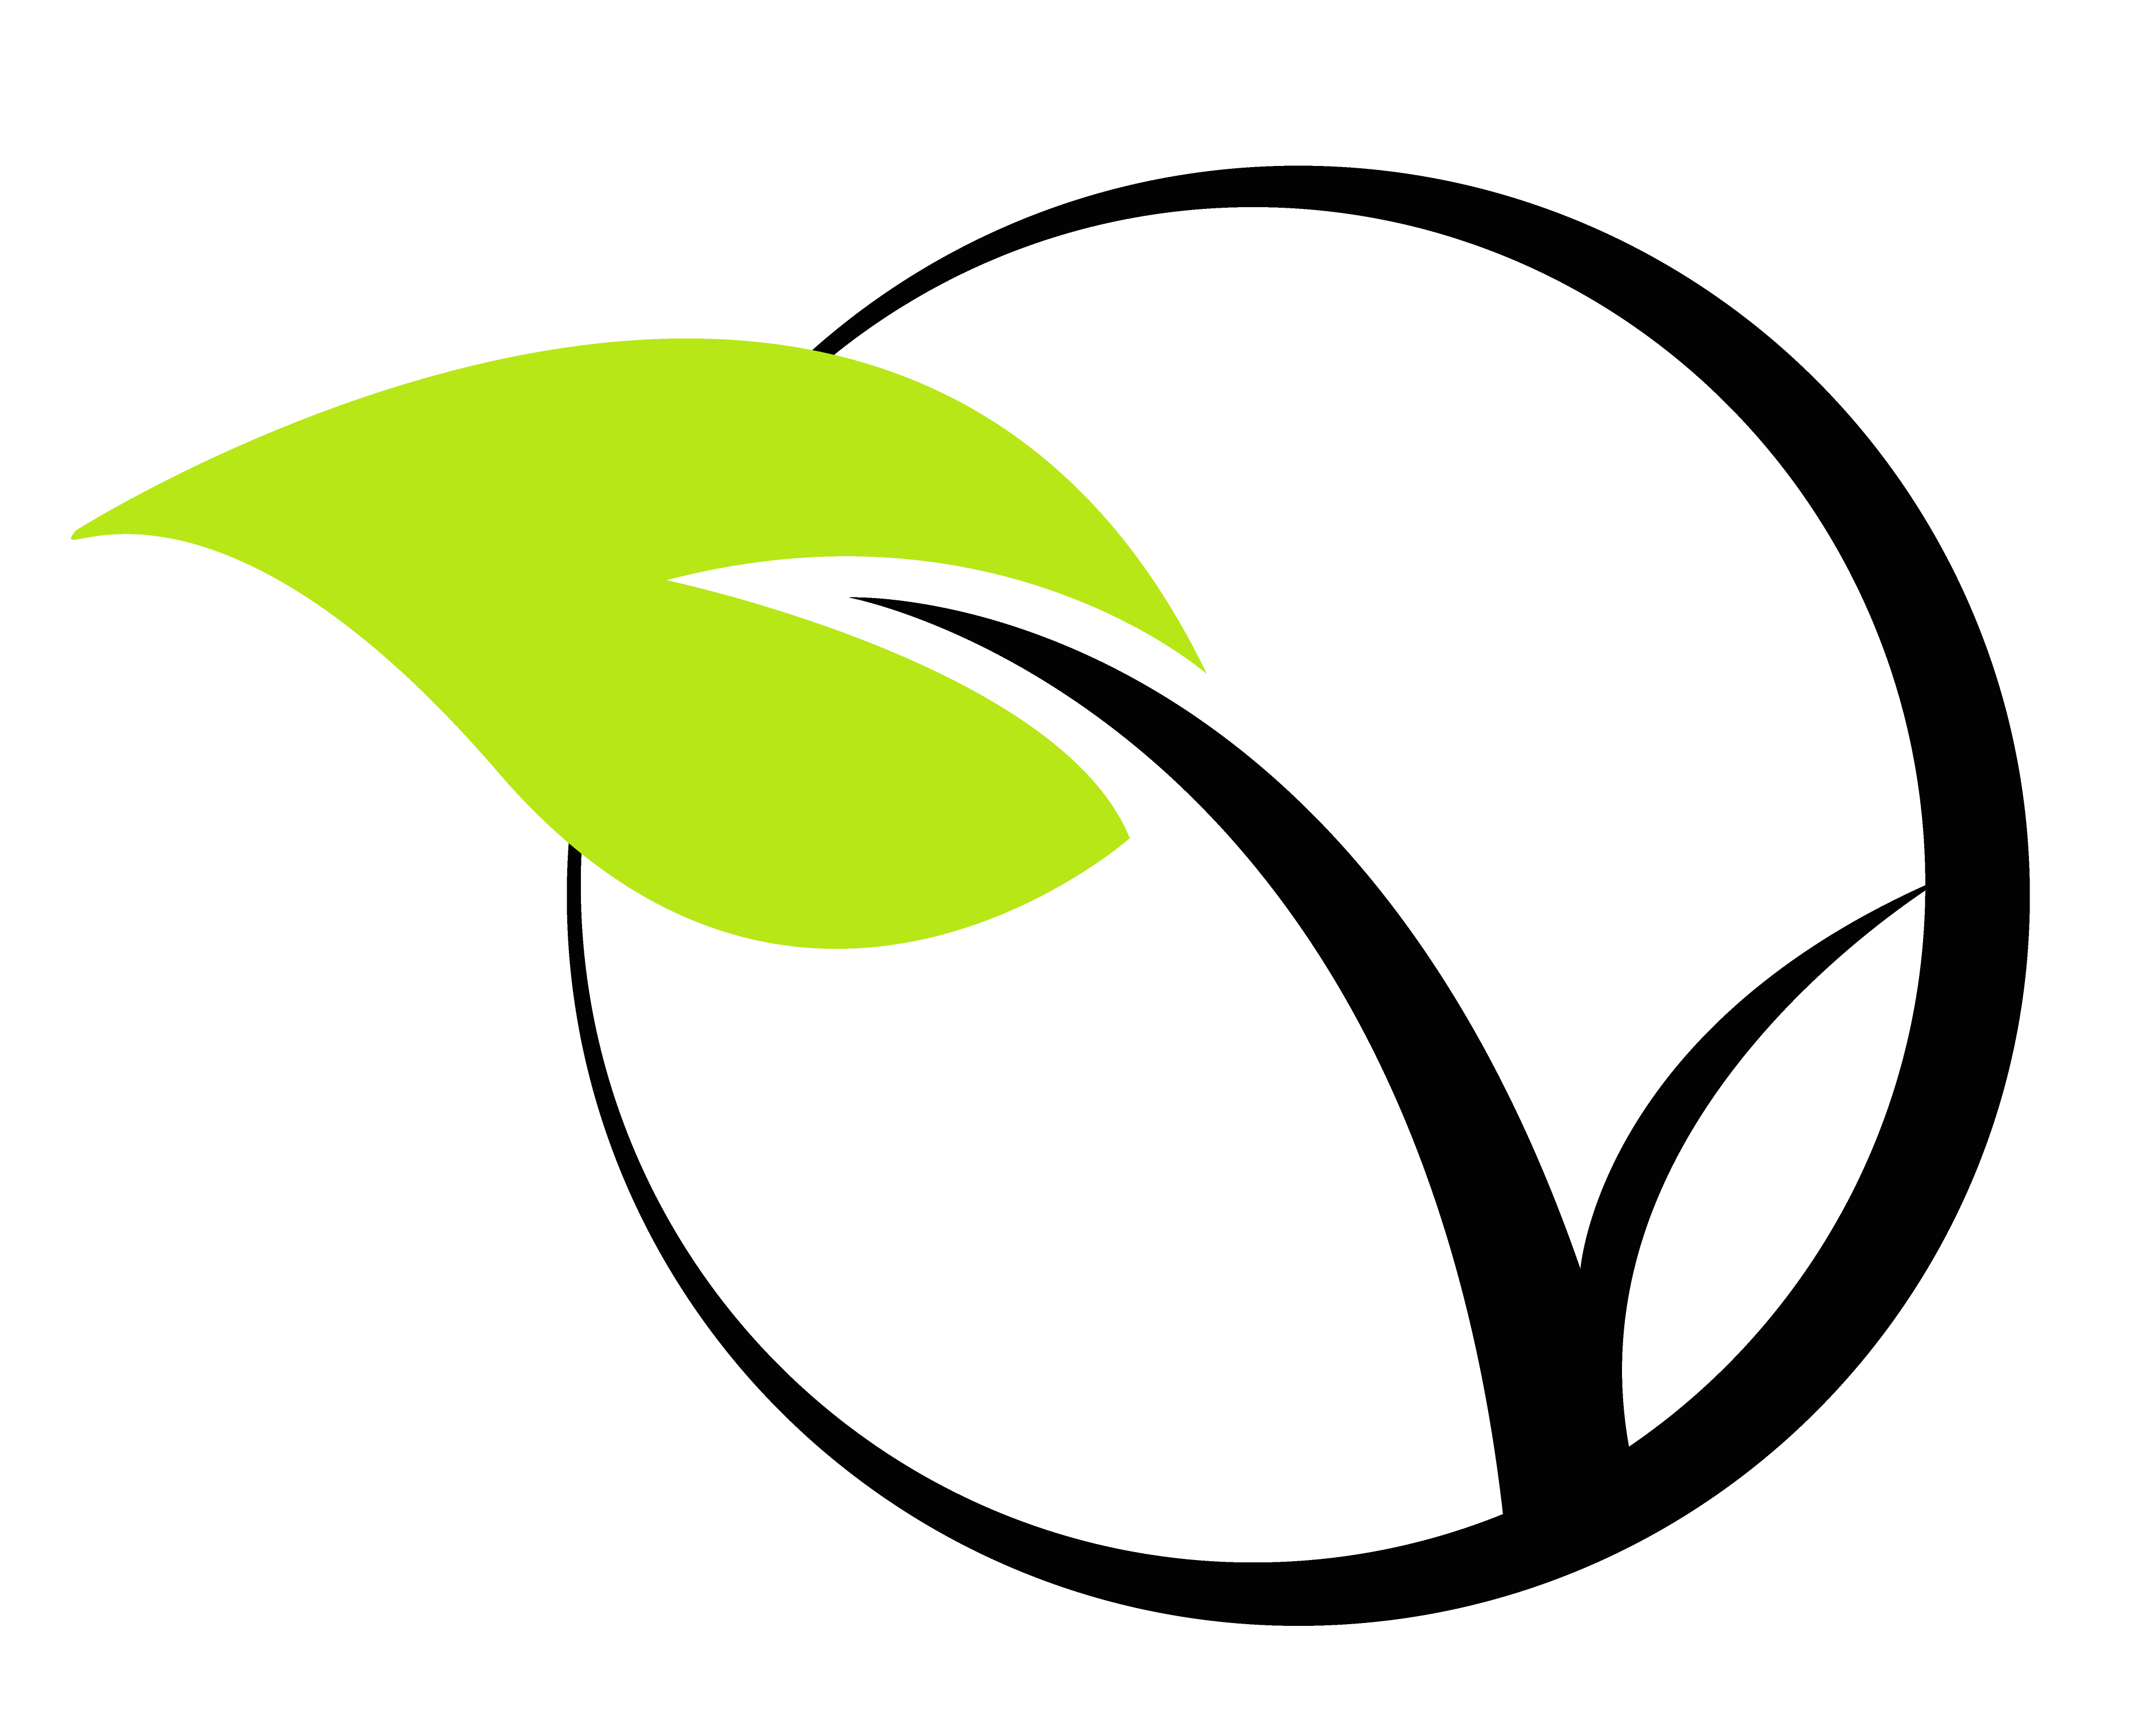 Logo Vrac de choix